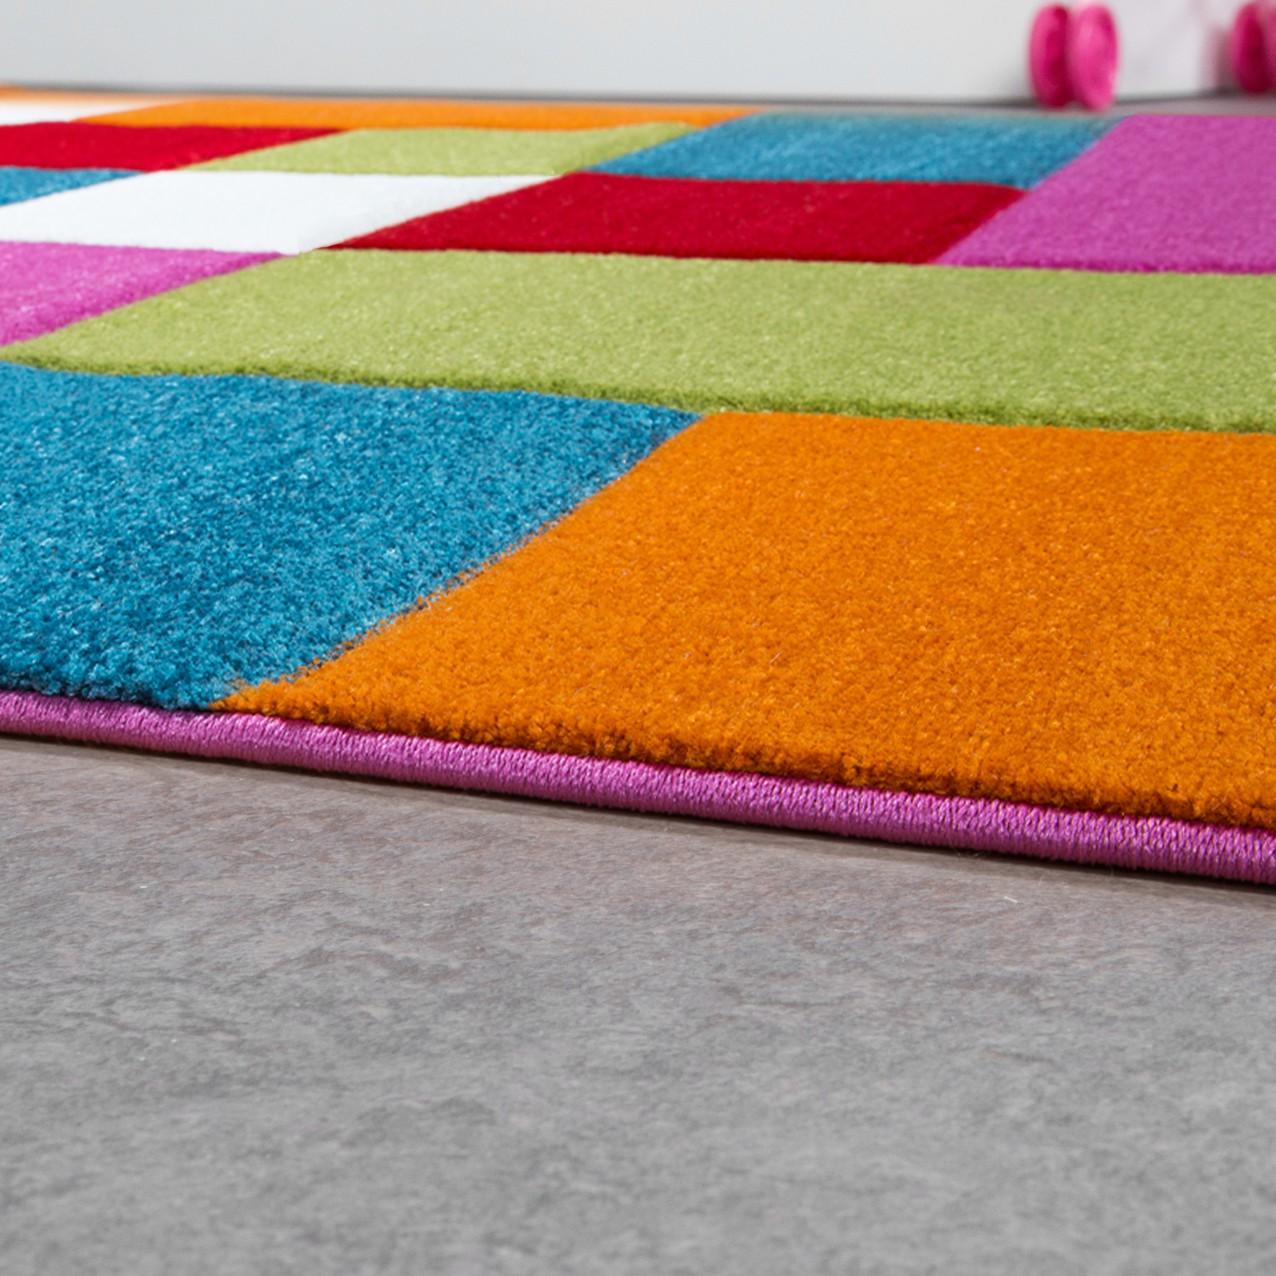 kinderzimmer teppich bunt creme gr n pink t rkis multicolour kariert spielzimmer kinderteppich. Black Bedroom Furniture Sets. Home Design Ideas